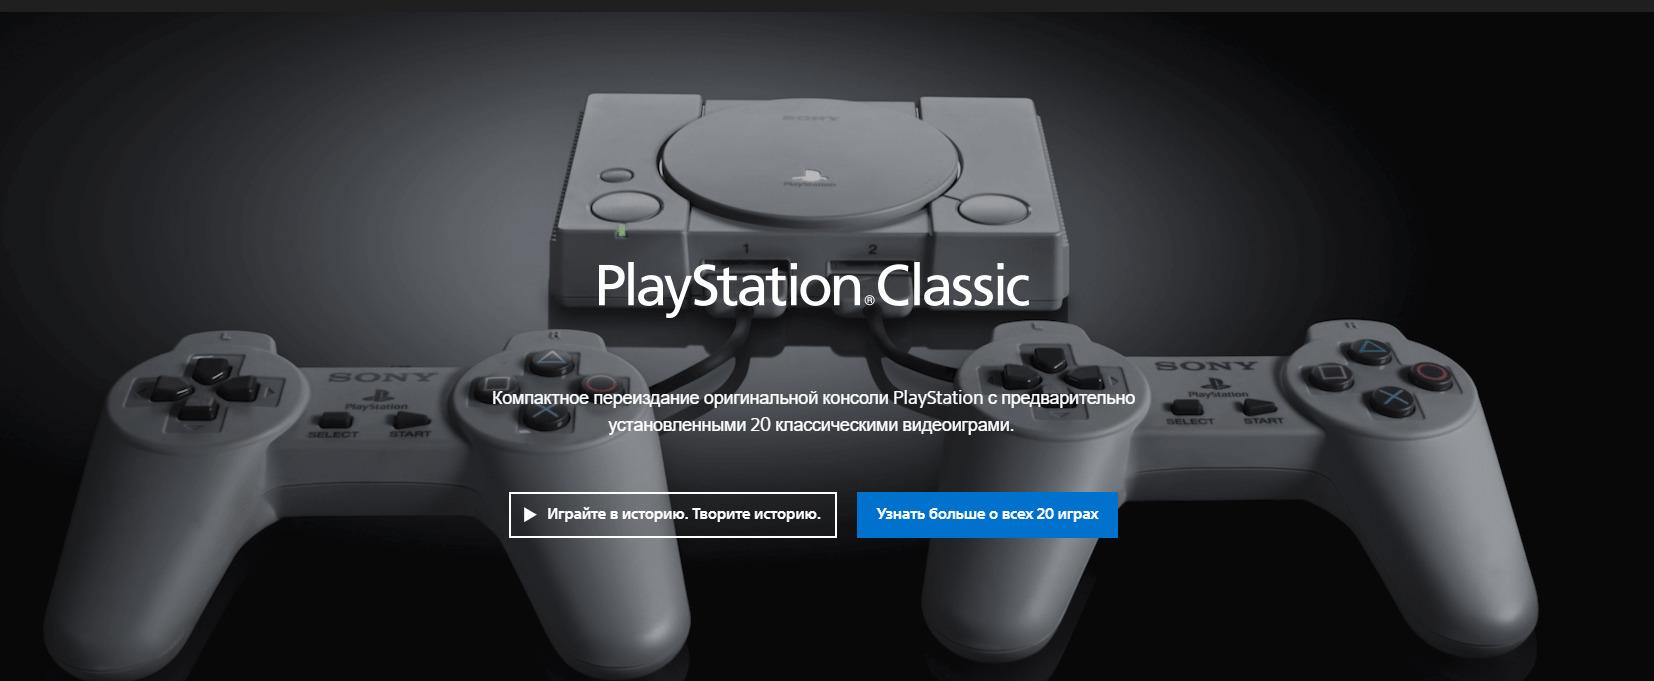 PlayStation Classic игры